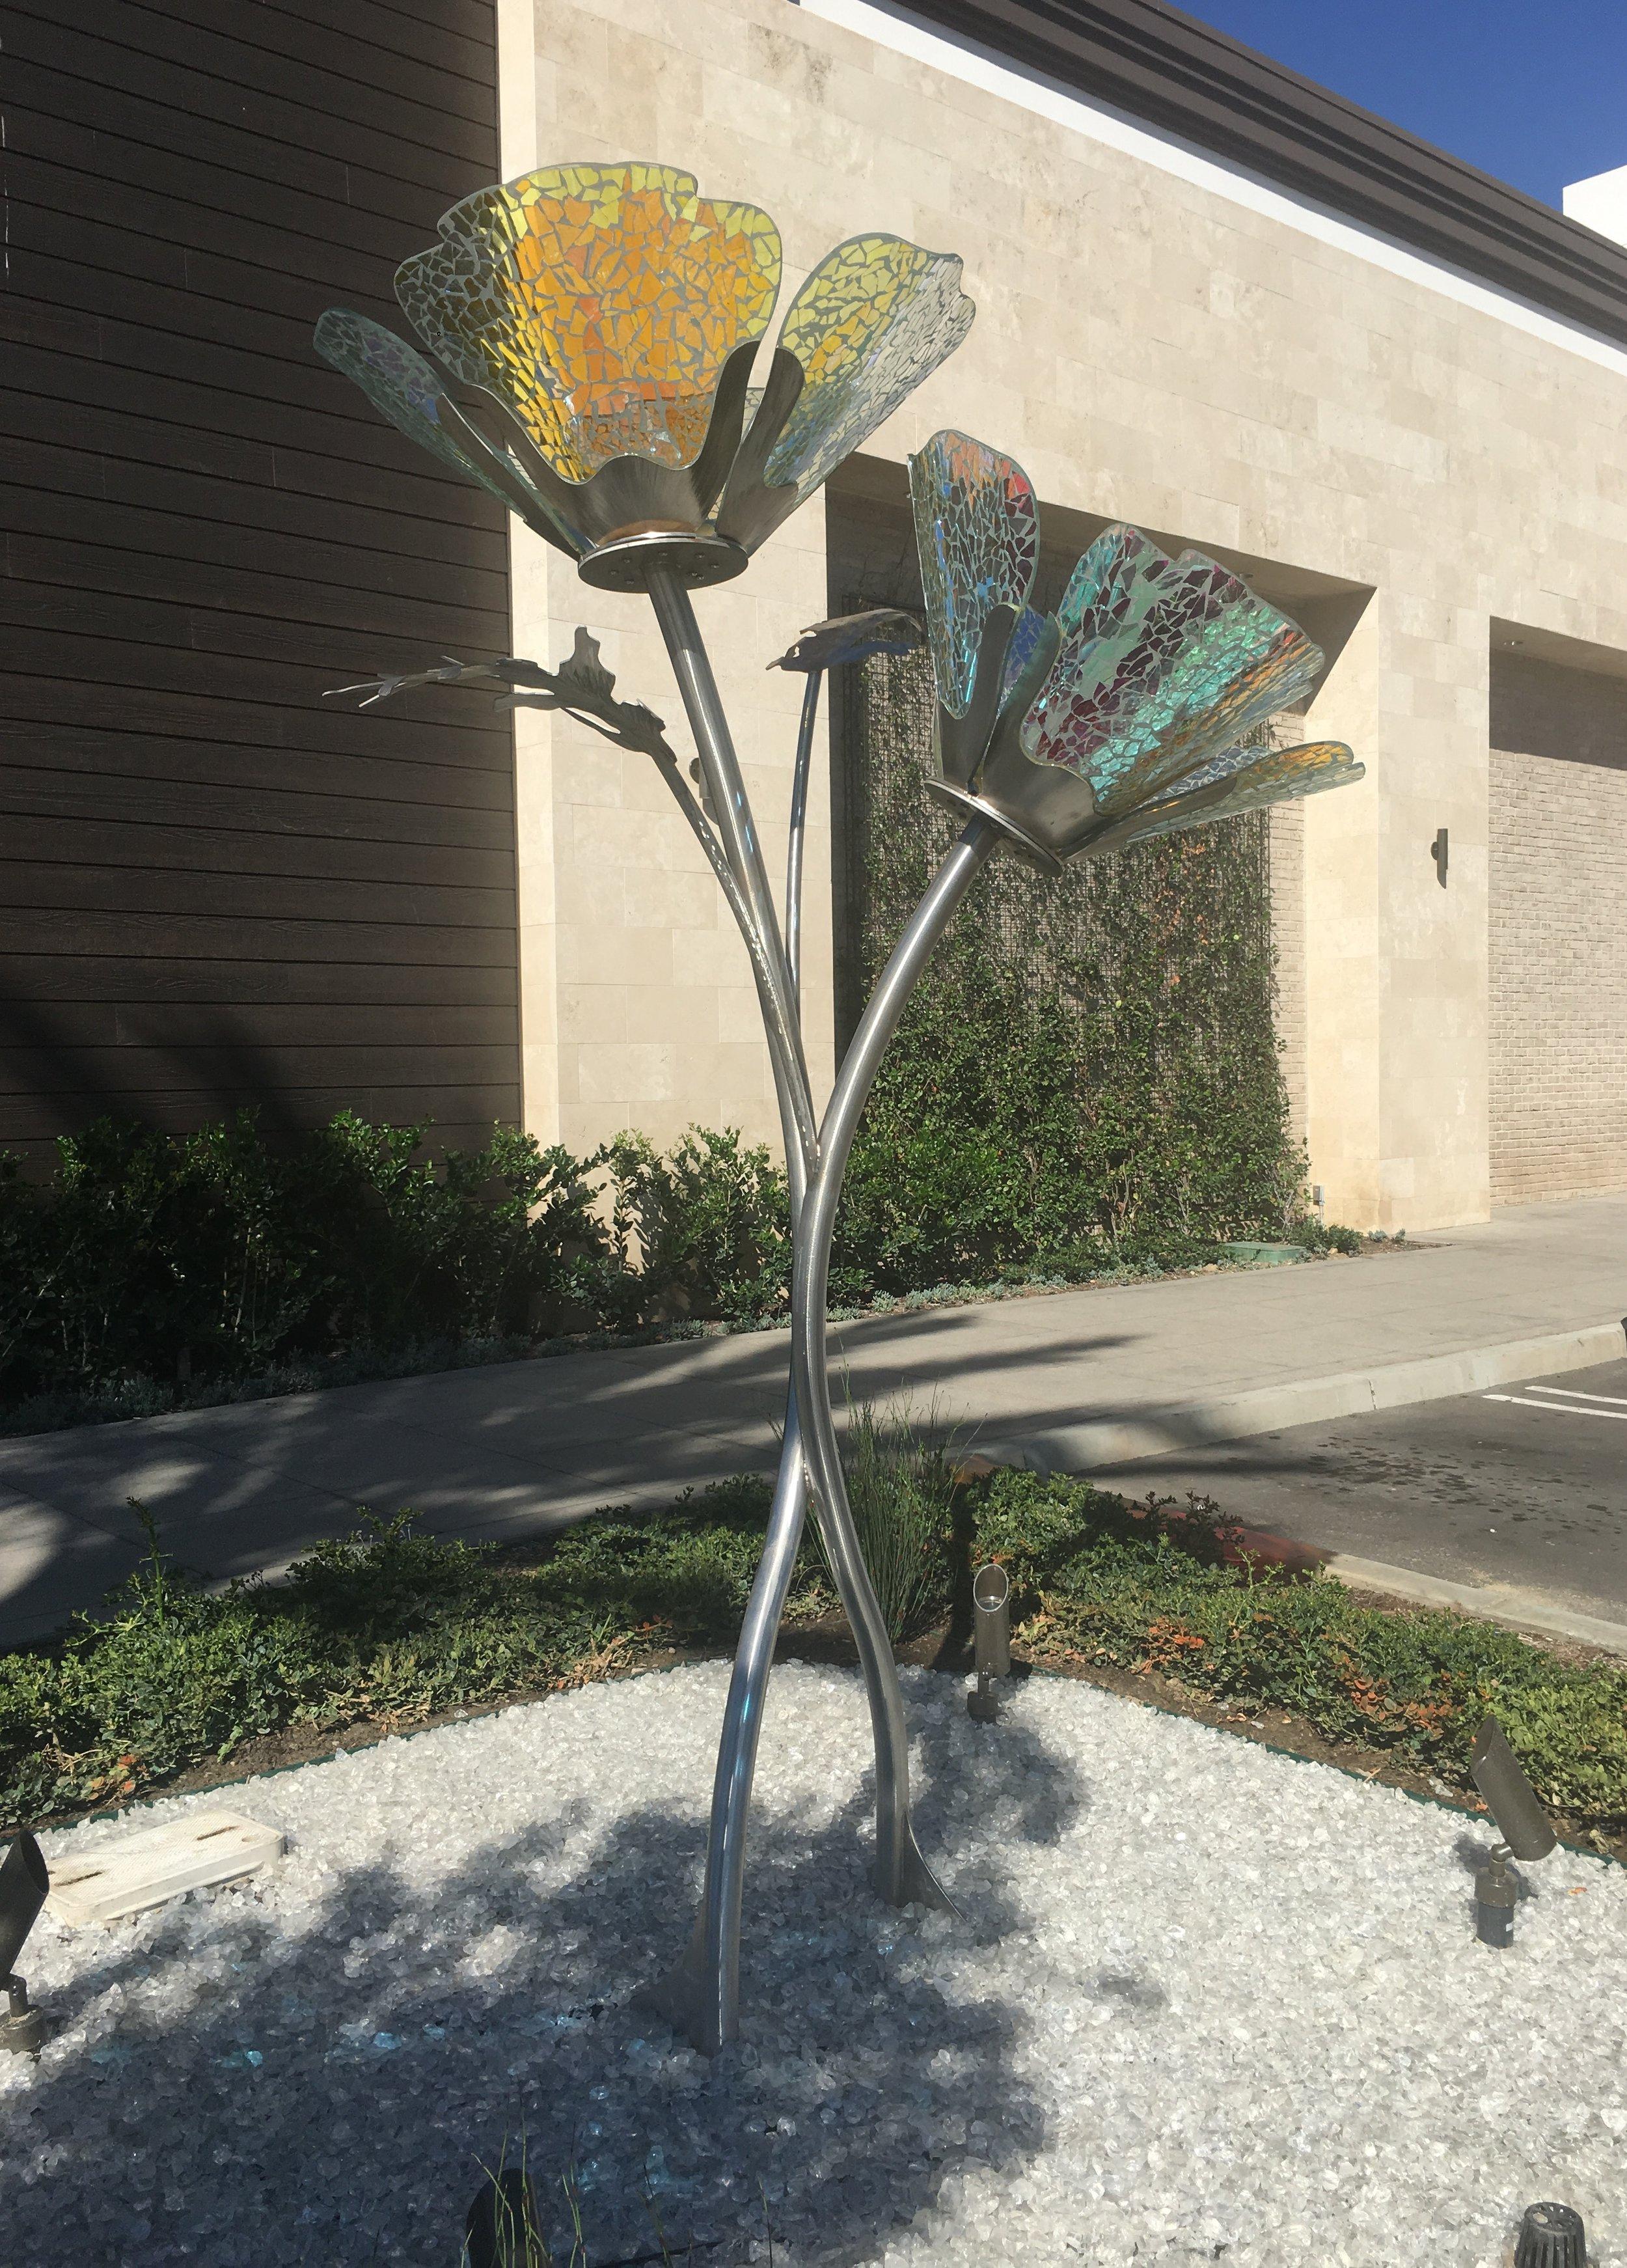 Deanne Sabeck, CenterCal Plaza 183, Cerritos, CA